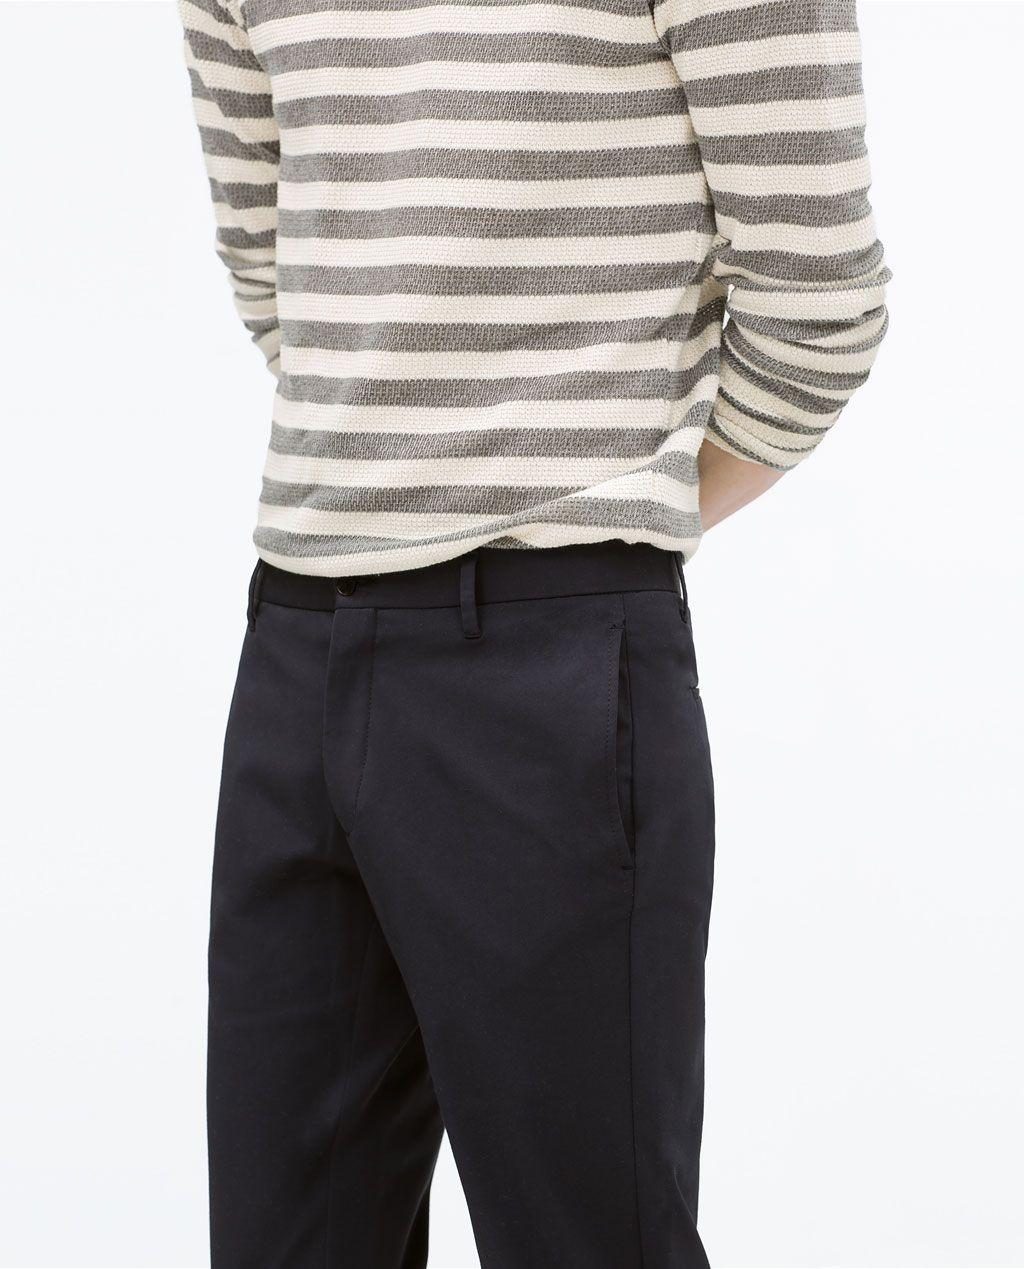 pantalon tissu homme zara